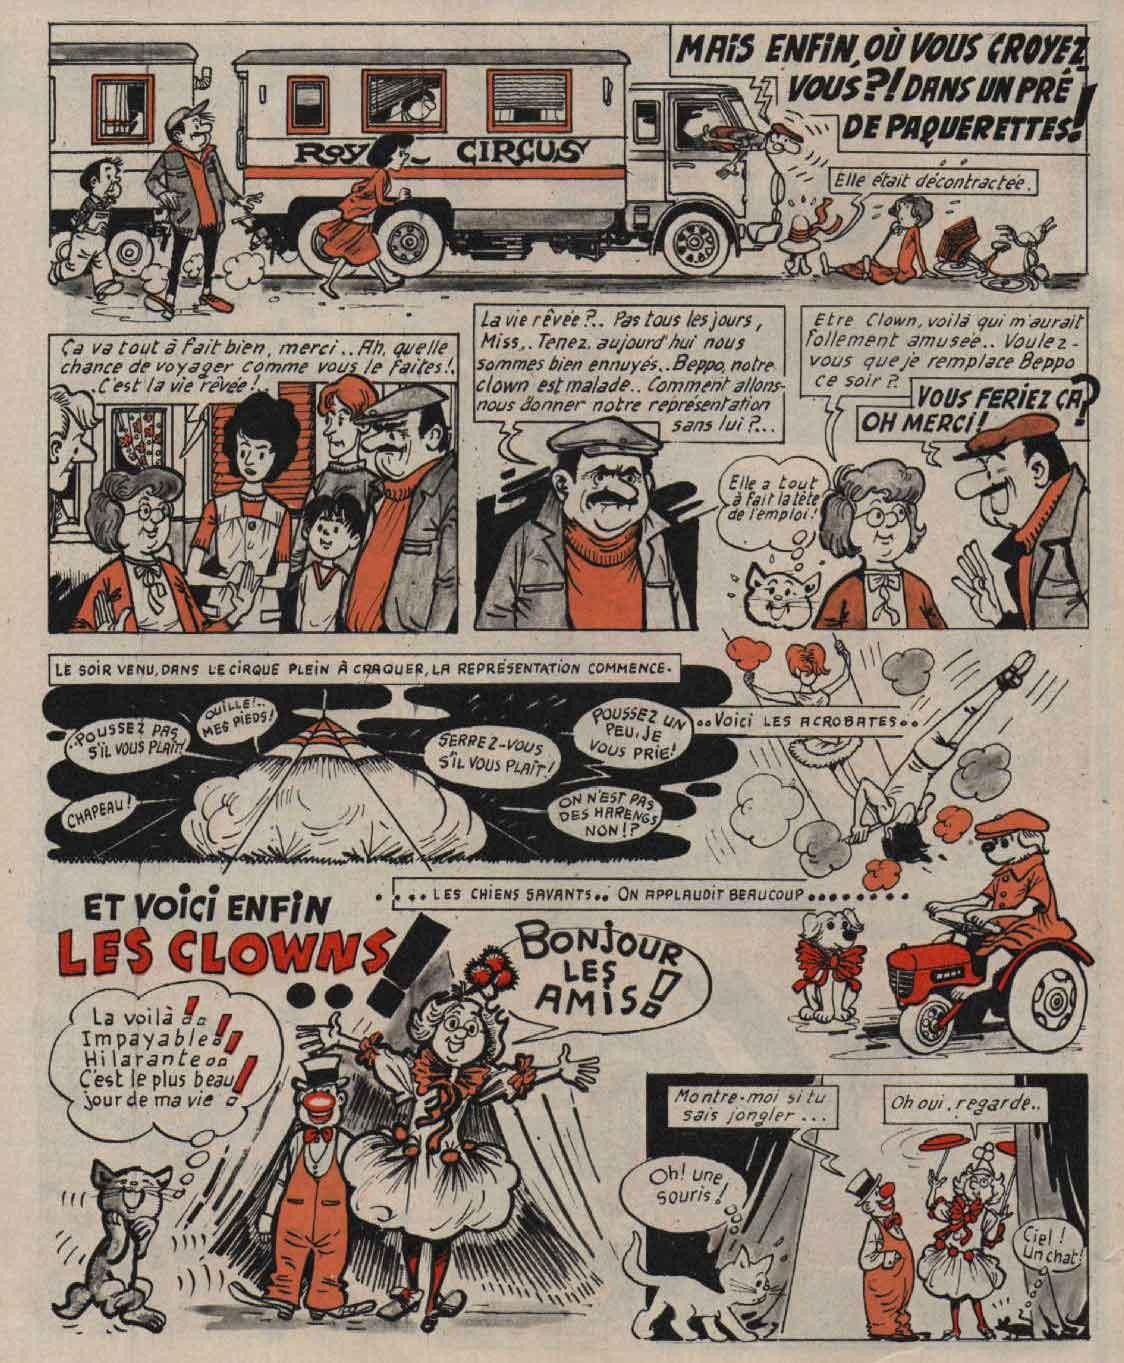 «Miss Justine» : Fripounet n°40 (02/10/1969).